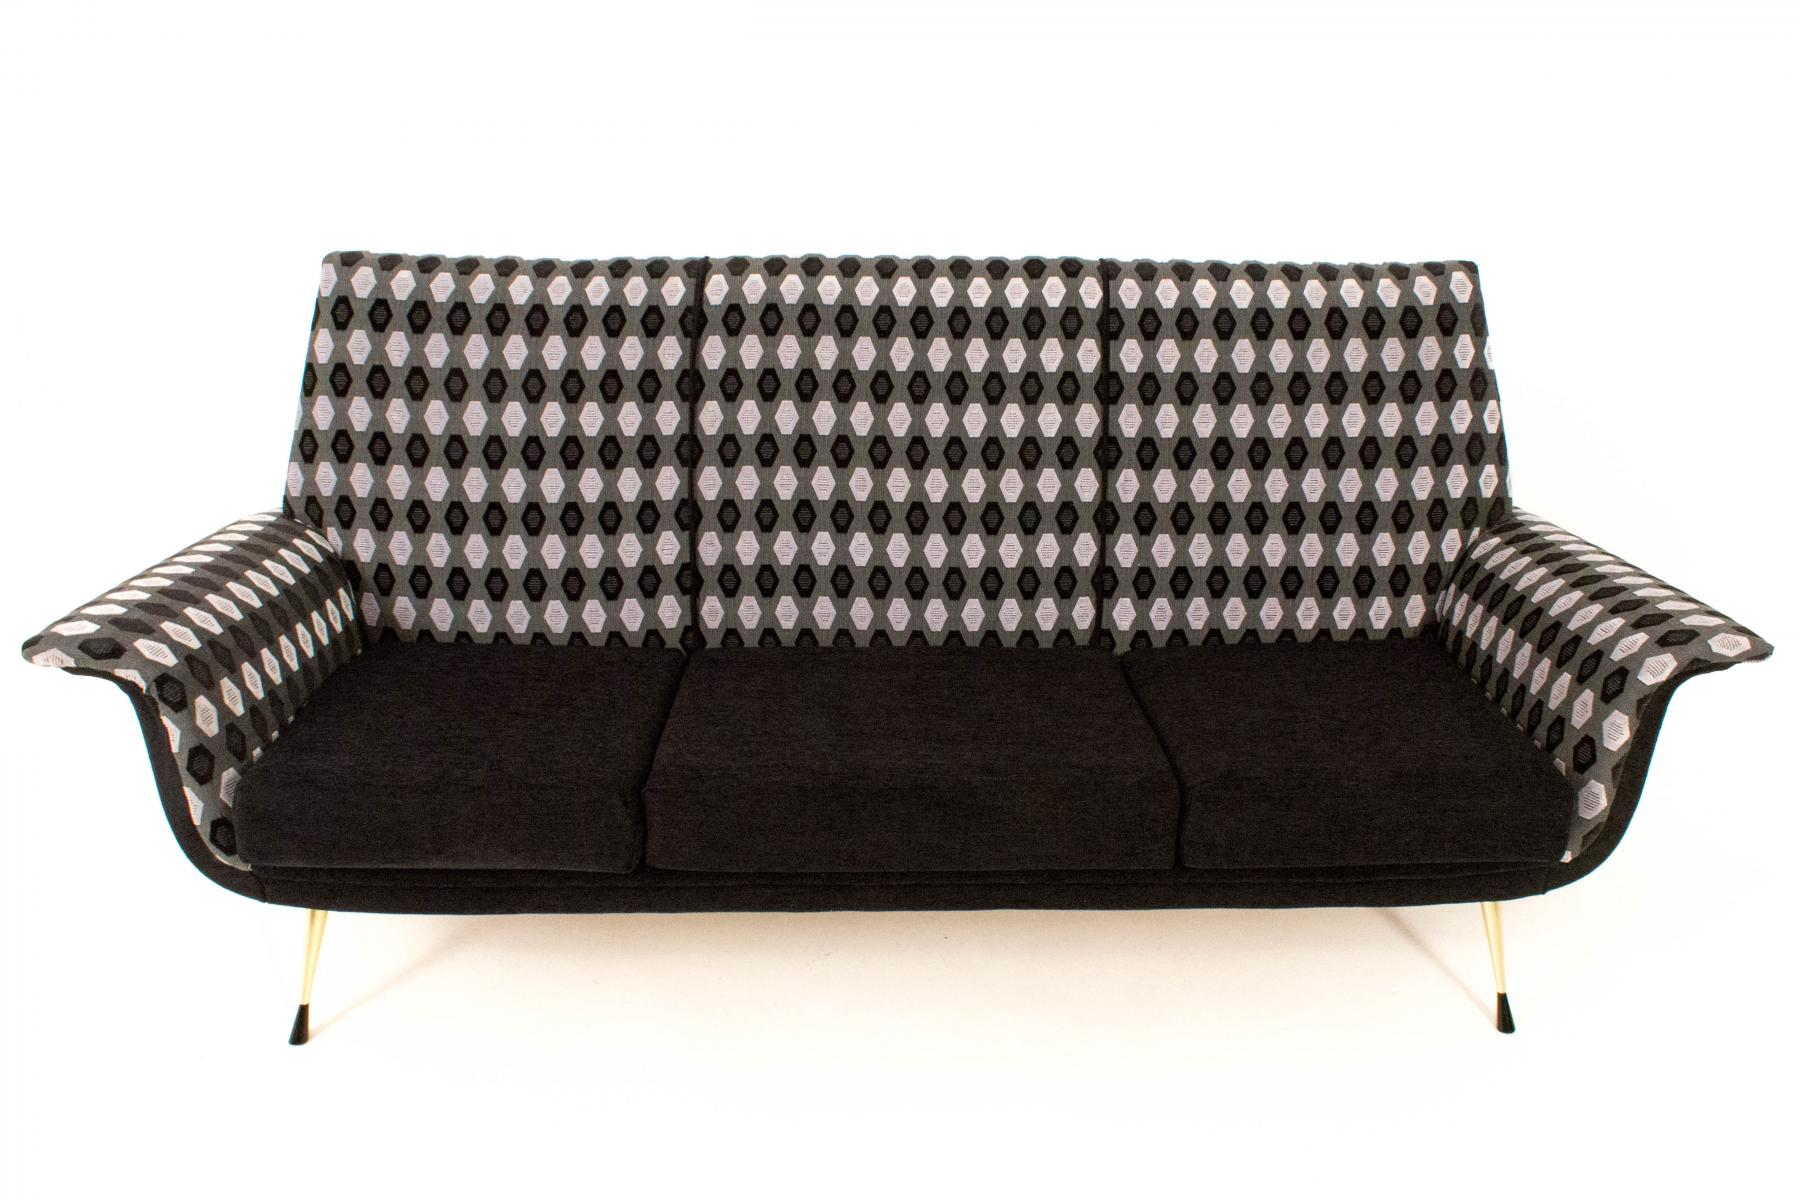 italian sofa price per piece RHUSDWU